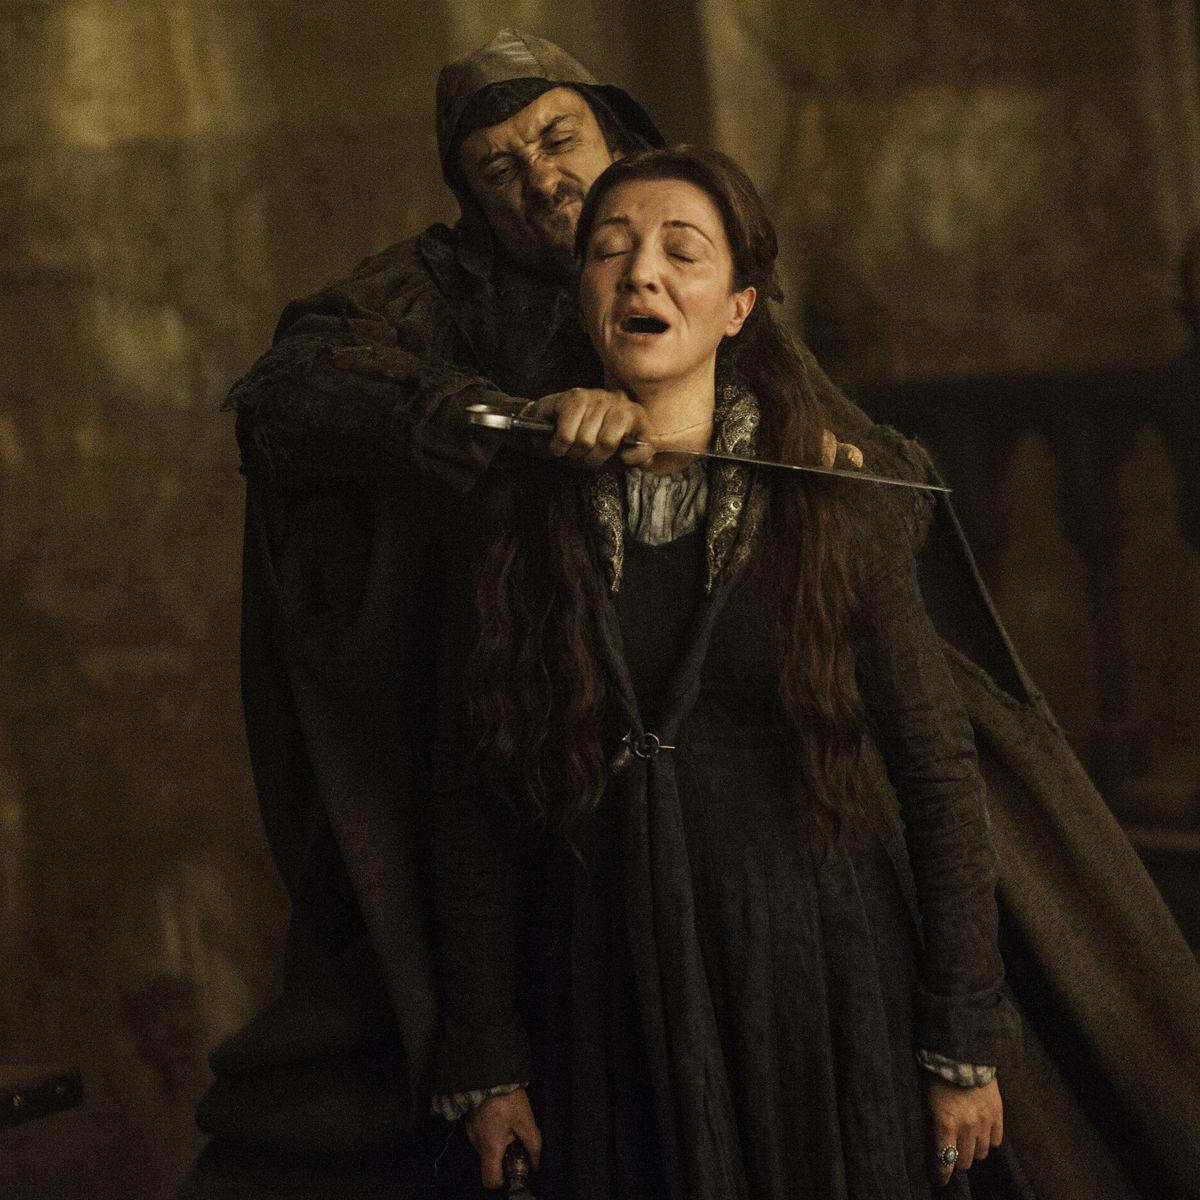 game_of_thrones_red_wedding_catelyn_stark.jpg